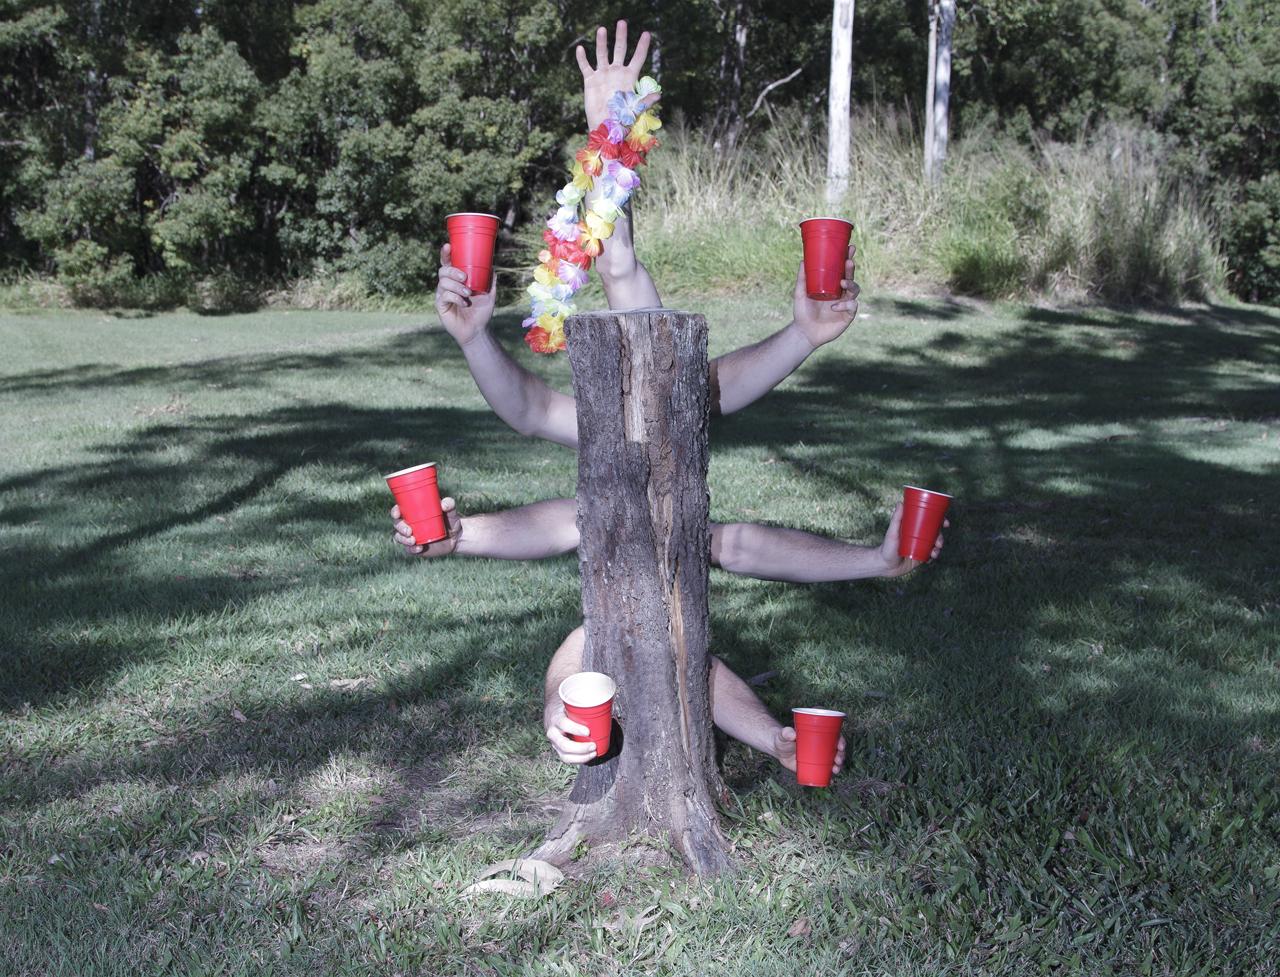 party stump smal jpog.jpg